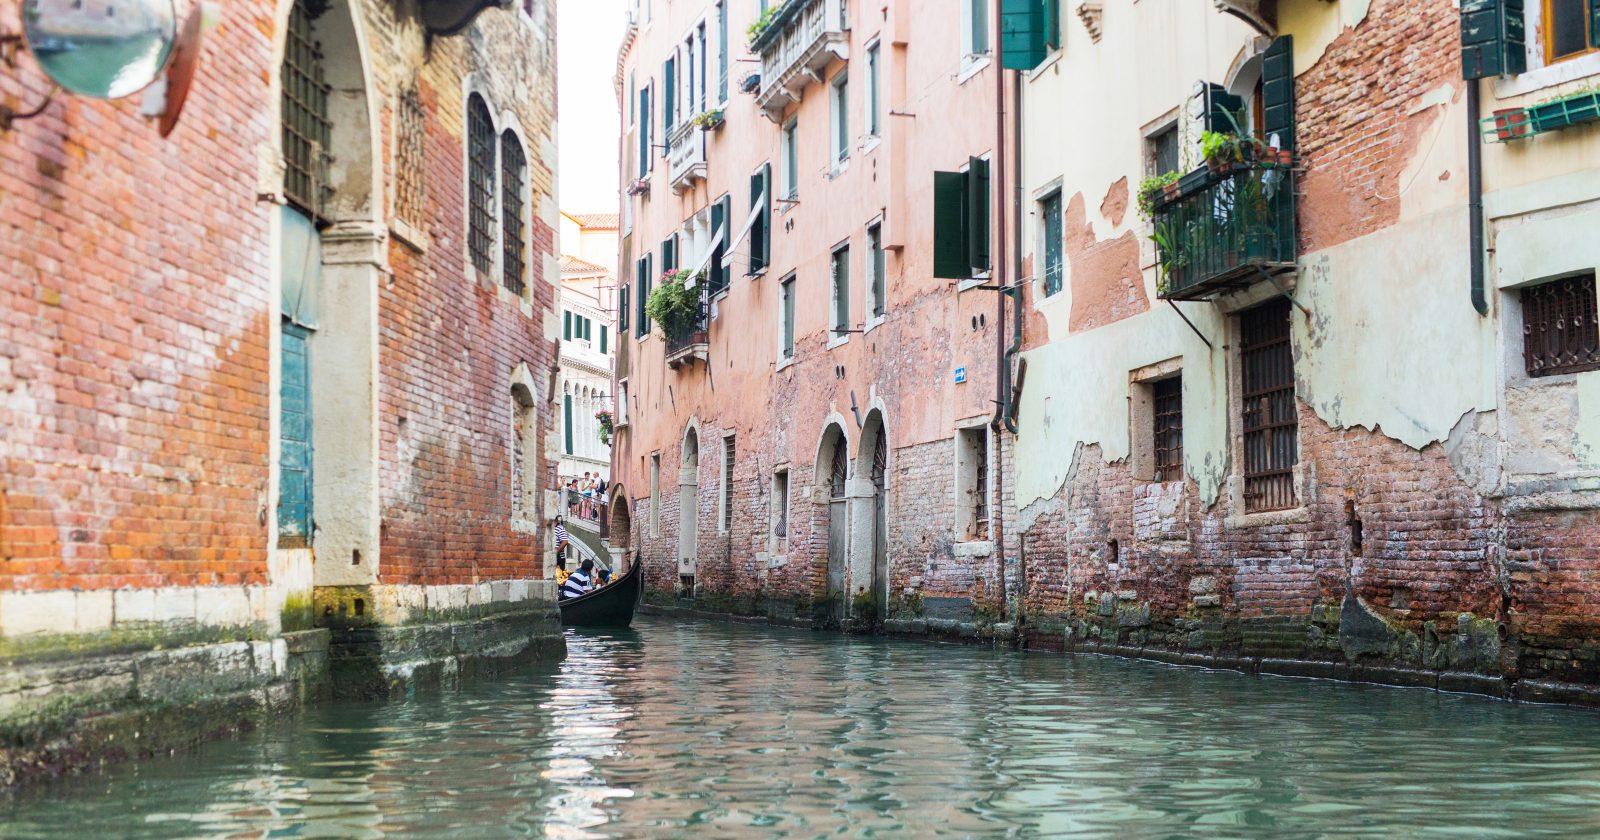 Our Italian Honeymoon: Part 4 {Venice & Burano}